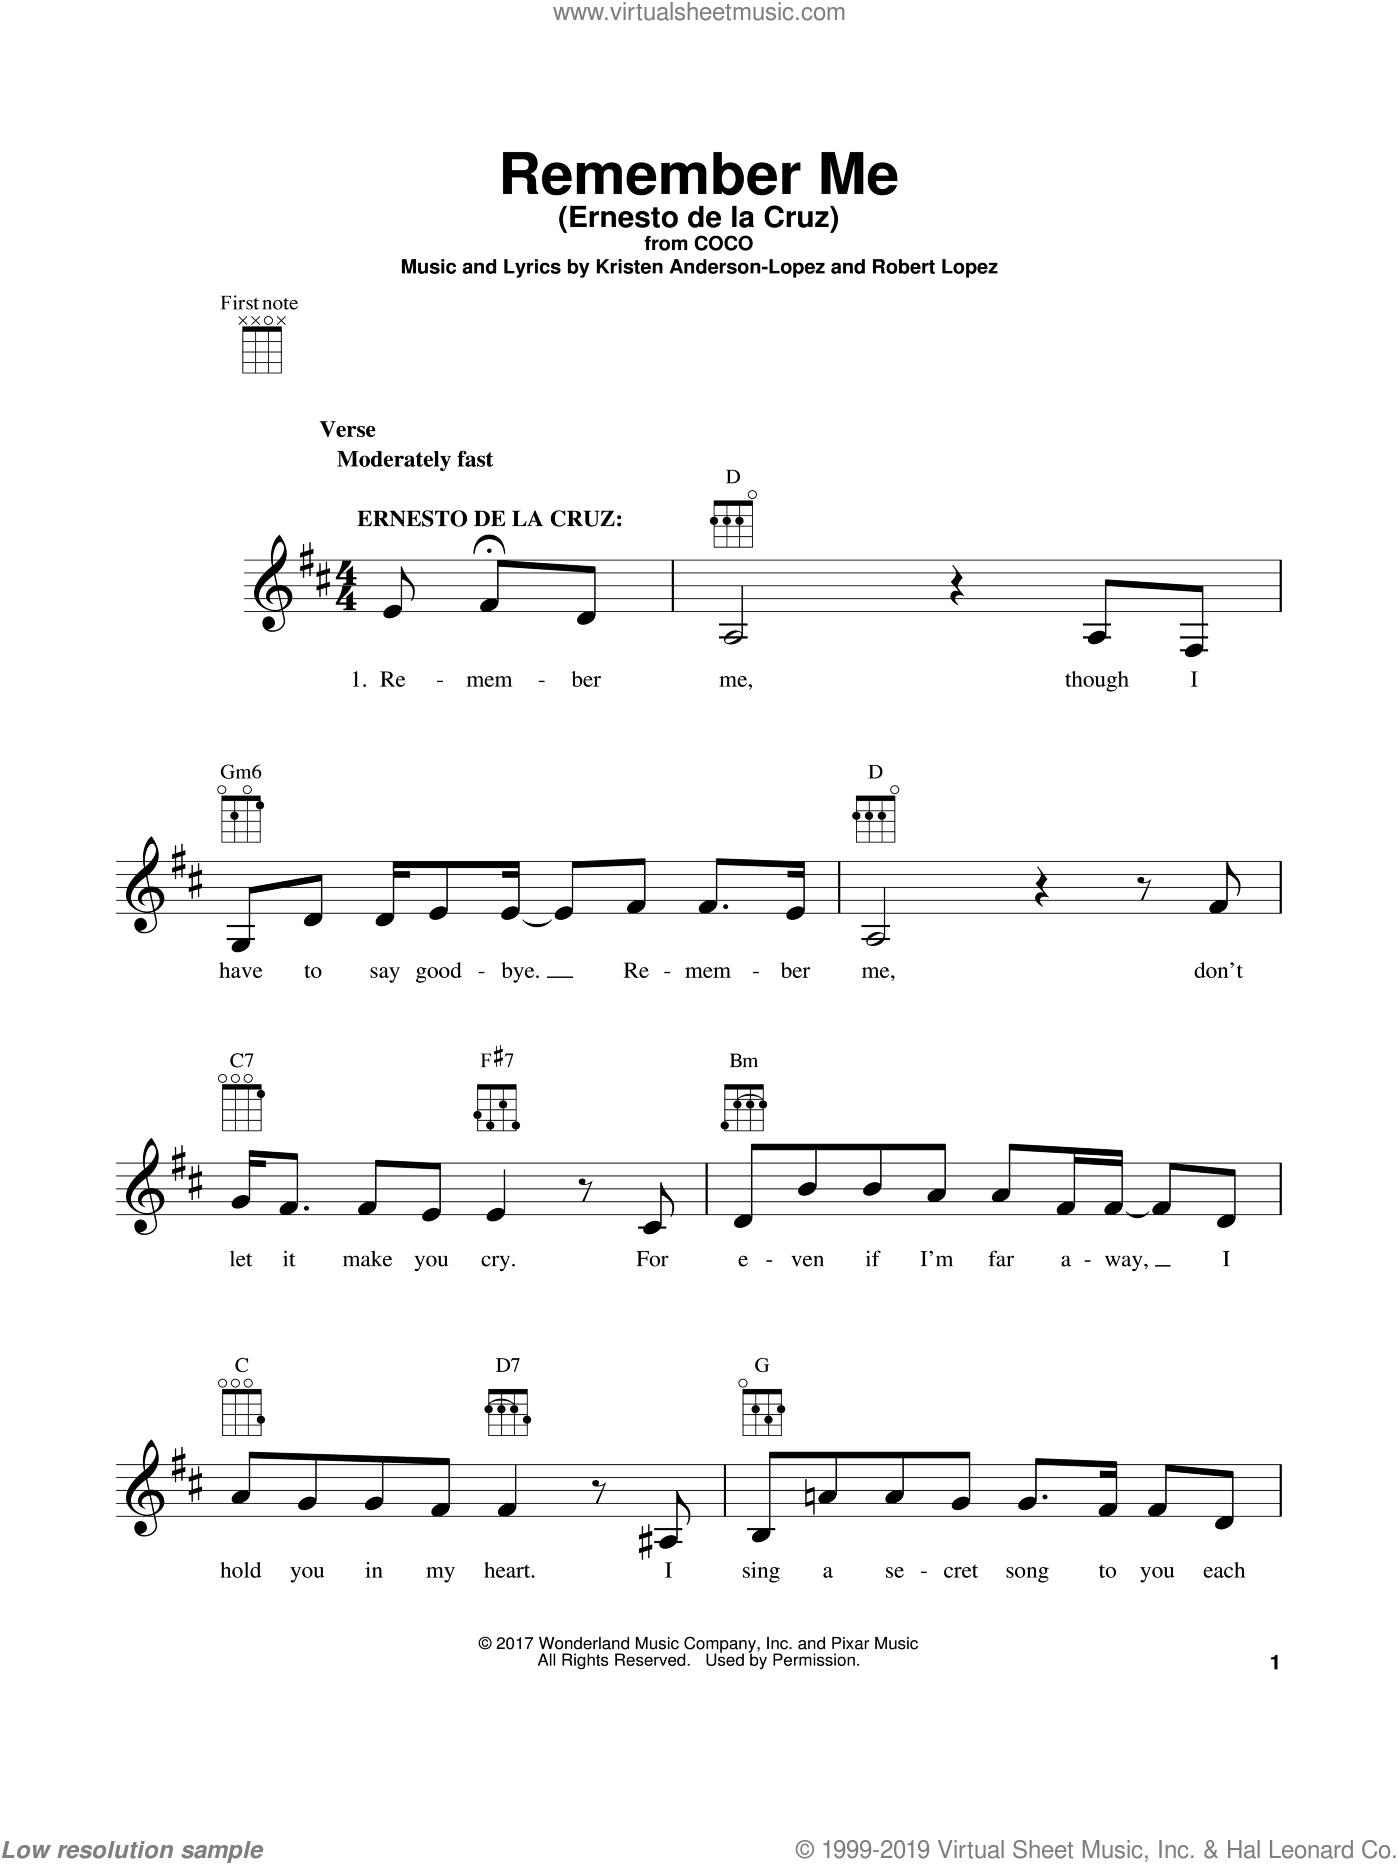 Remember Me (Ernesto de la Cruz) sheet music for ukulele by Kristen Anderson-Lopez, Coco (Movie) and Robert Lopez, intermediate skill level